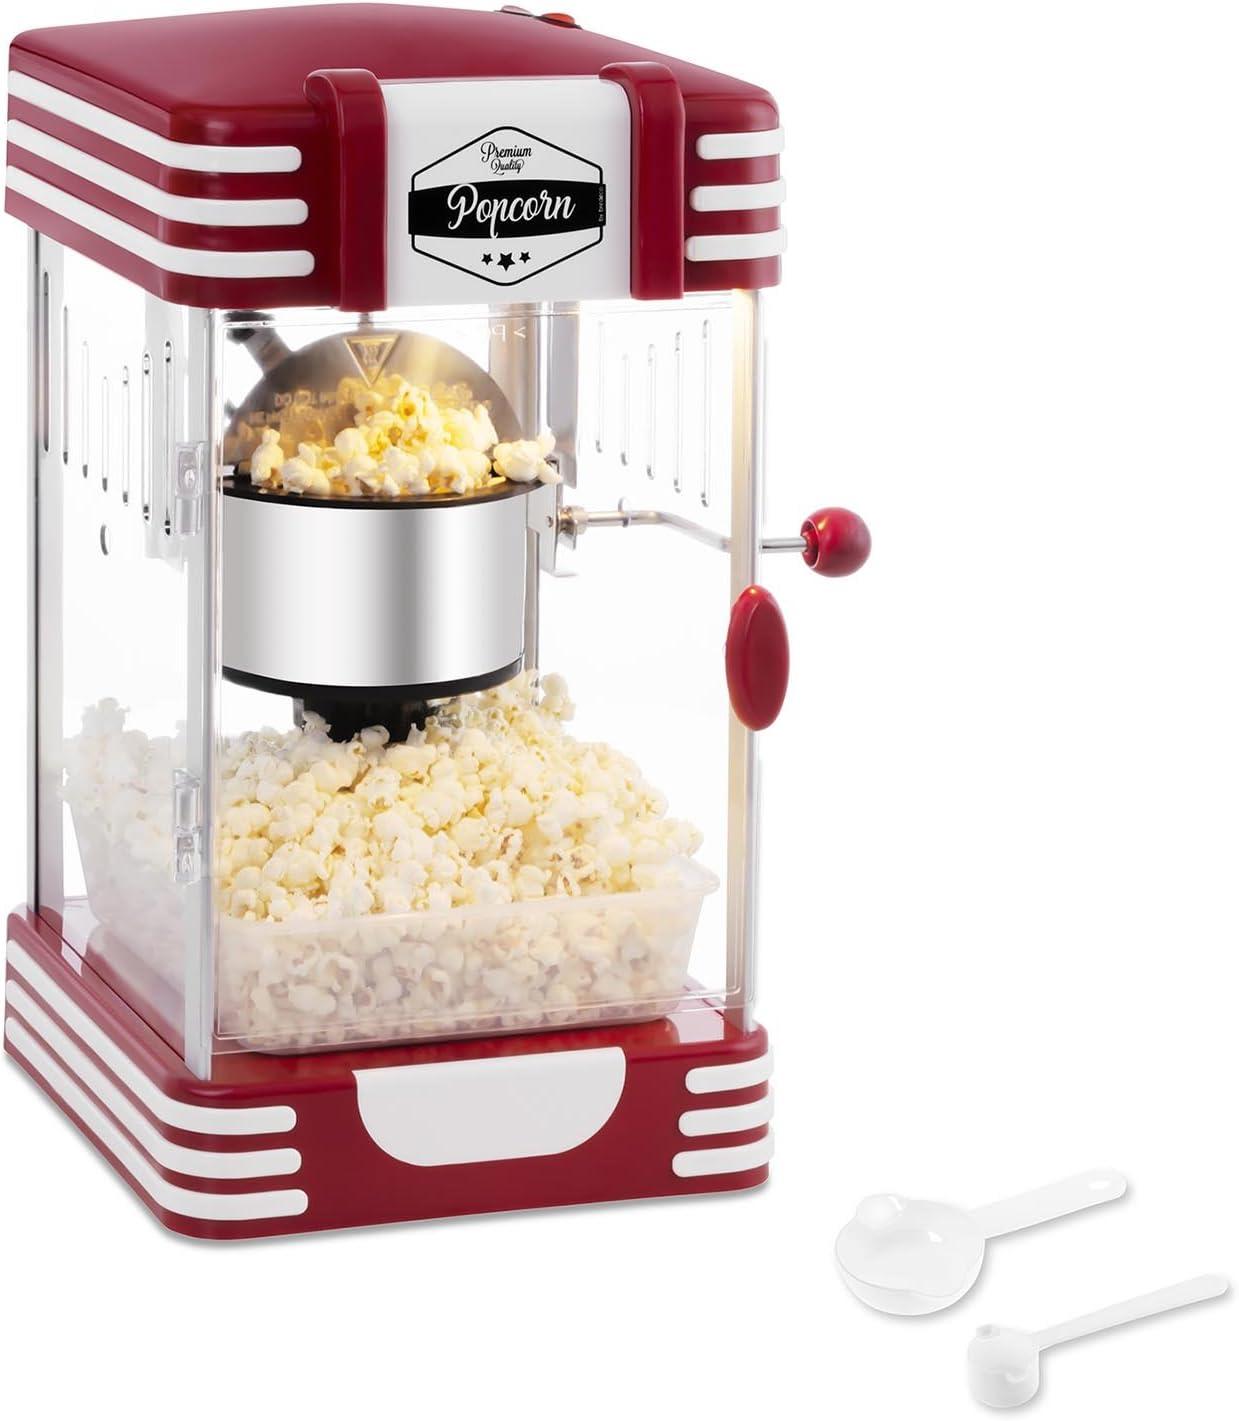 Bredeco BCPK-300-WR Palomitera Mini Máquina de Palomitas (300 W / 100 s, Porción de Maíz 57 g, Revestimiento de Téflon, Cuchara Dosificadora Multi Función incl., 28,5 x 32,5 x 46 cm) Roja Diseño Retro: Amazon.es: Hogar